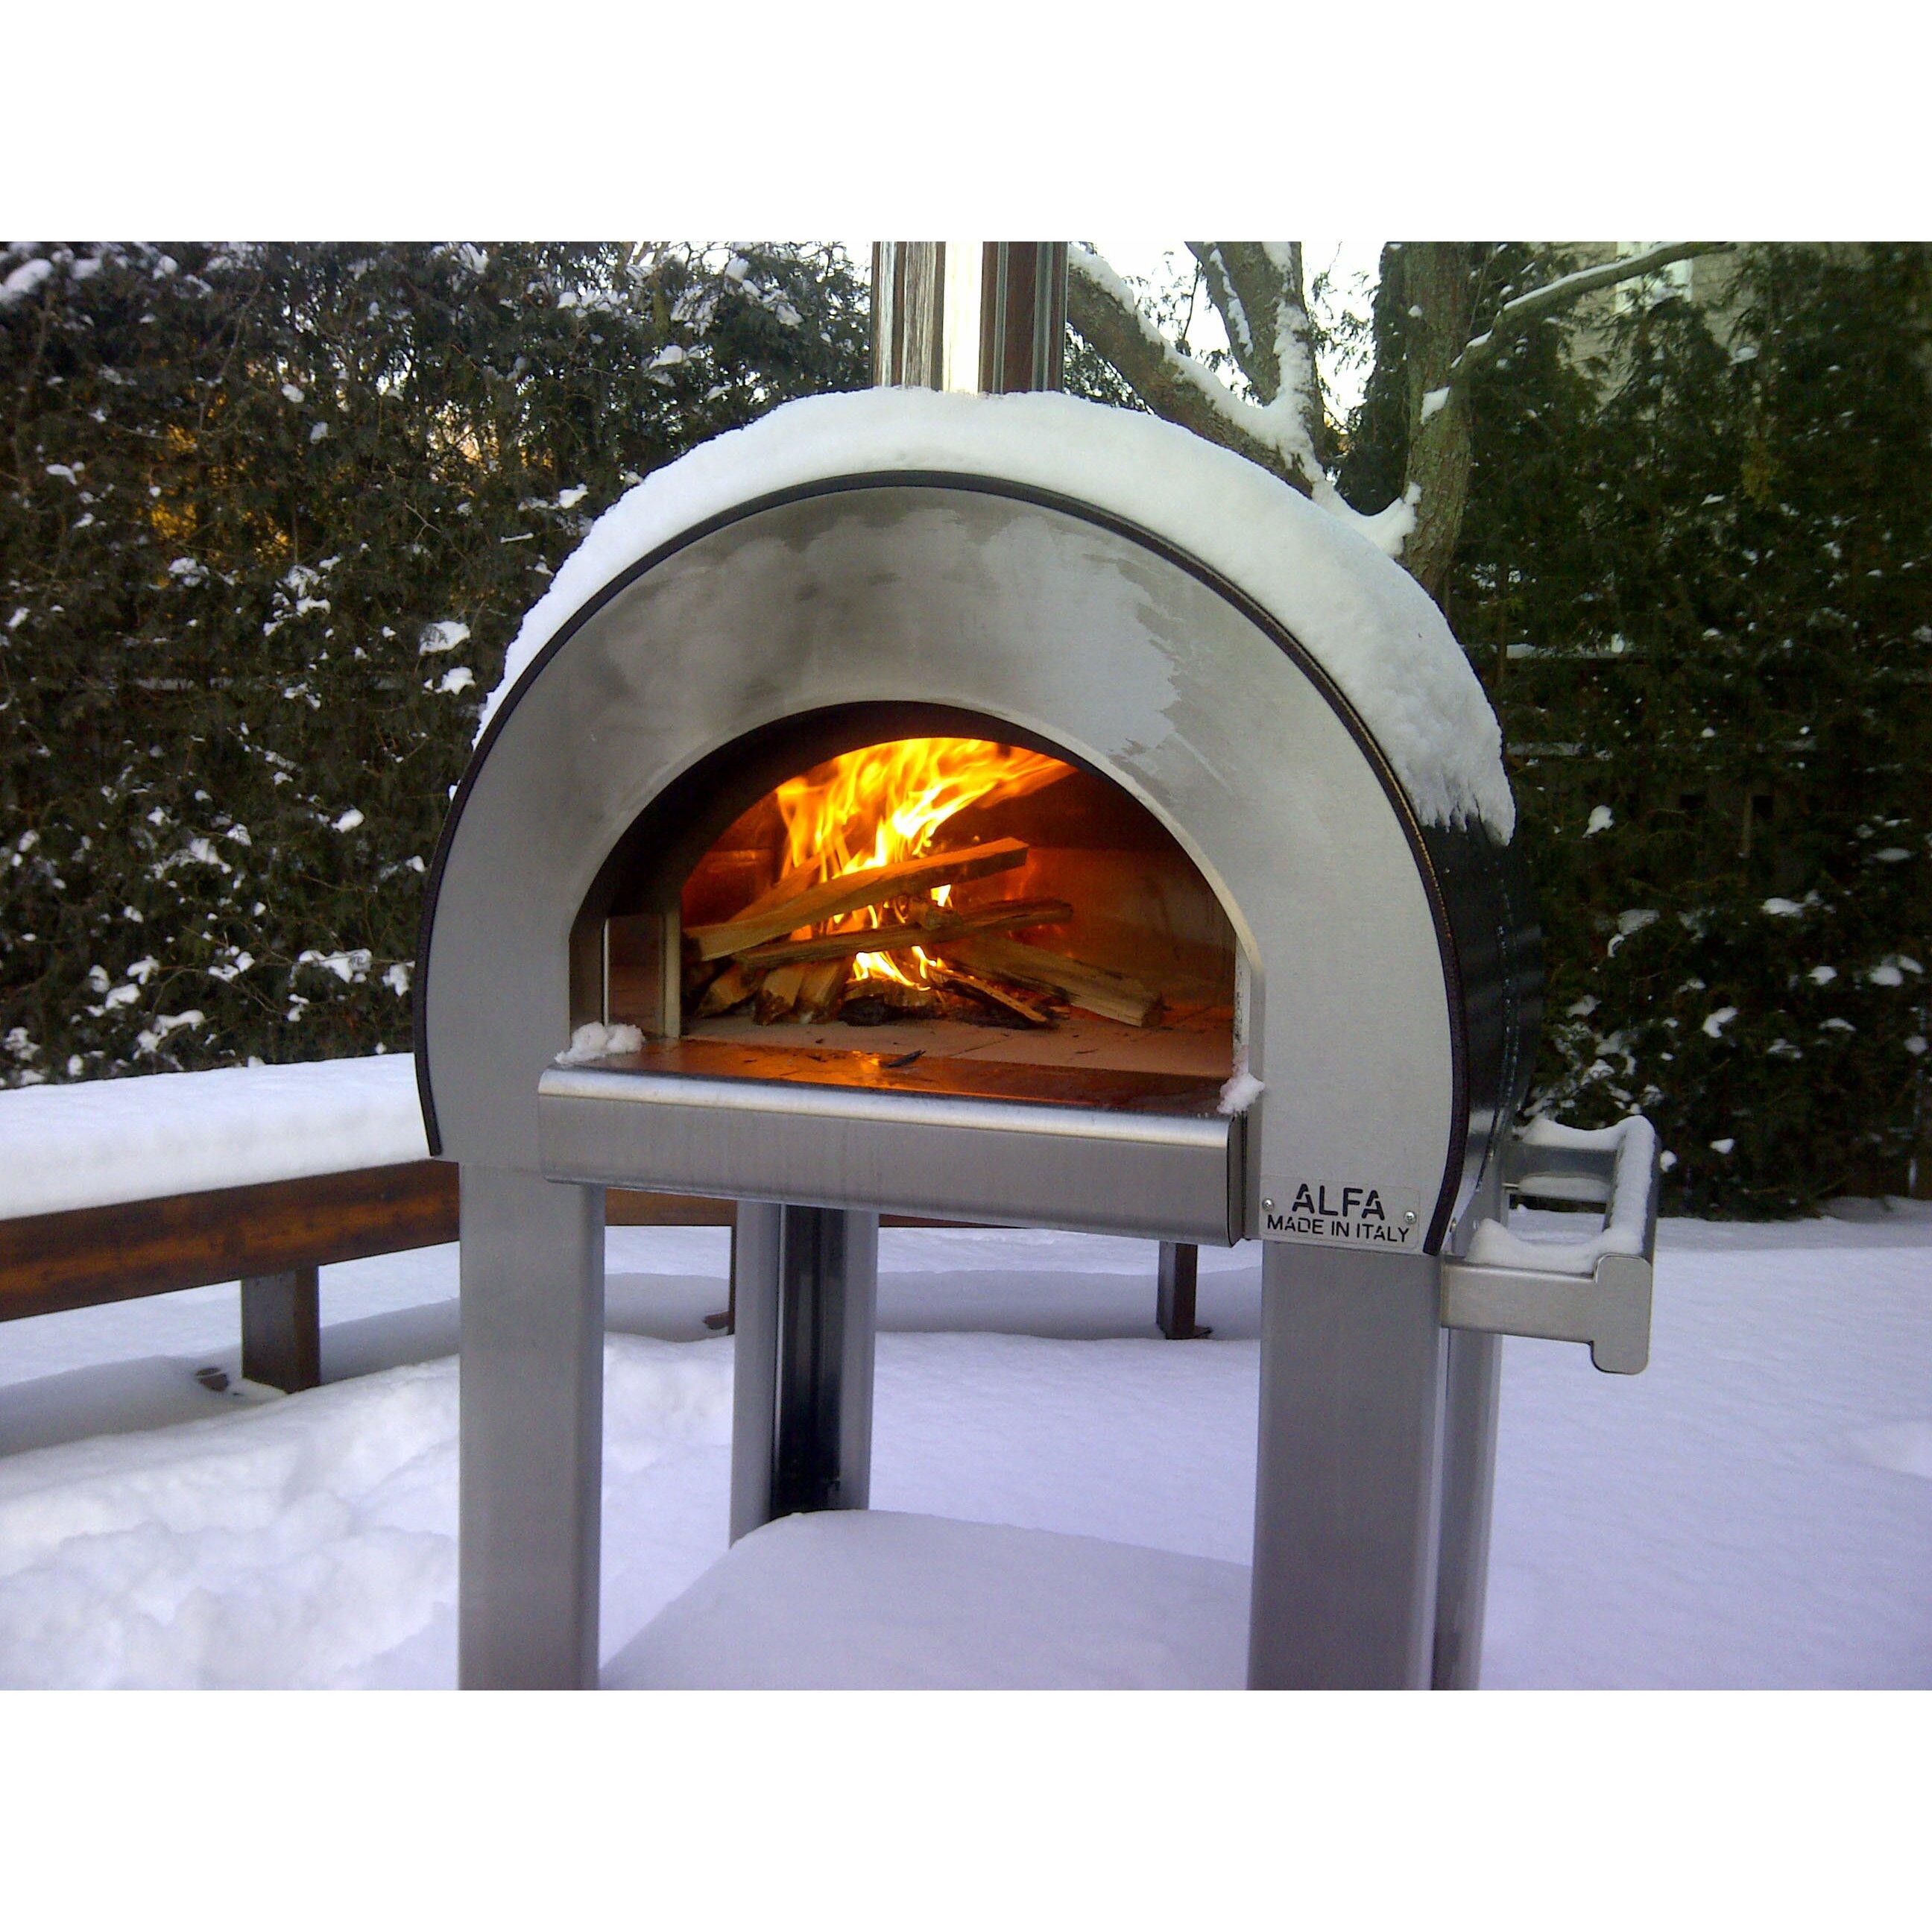 Alfa Pizza Forno 5 Wood Burning Pizza Oven & Reviews   Wayfair